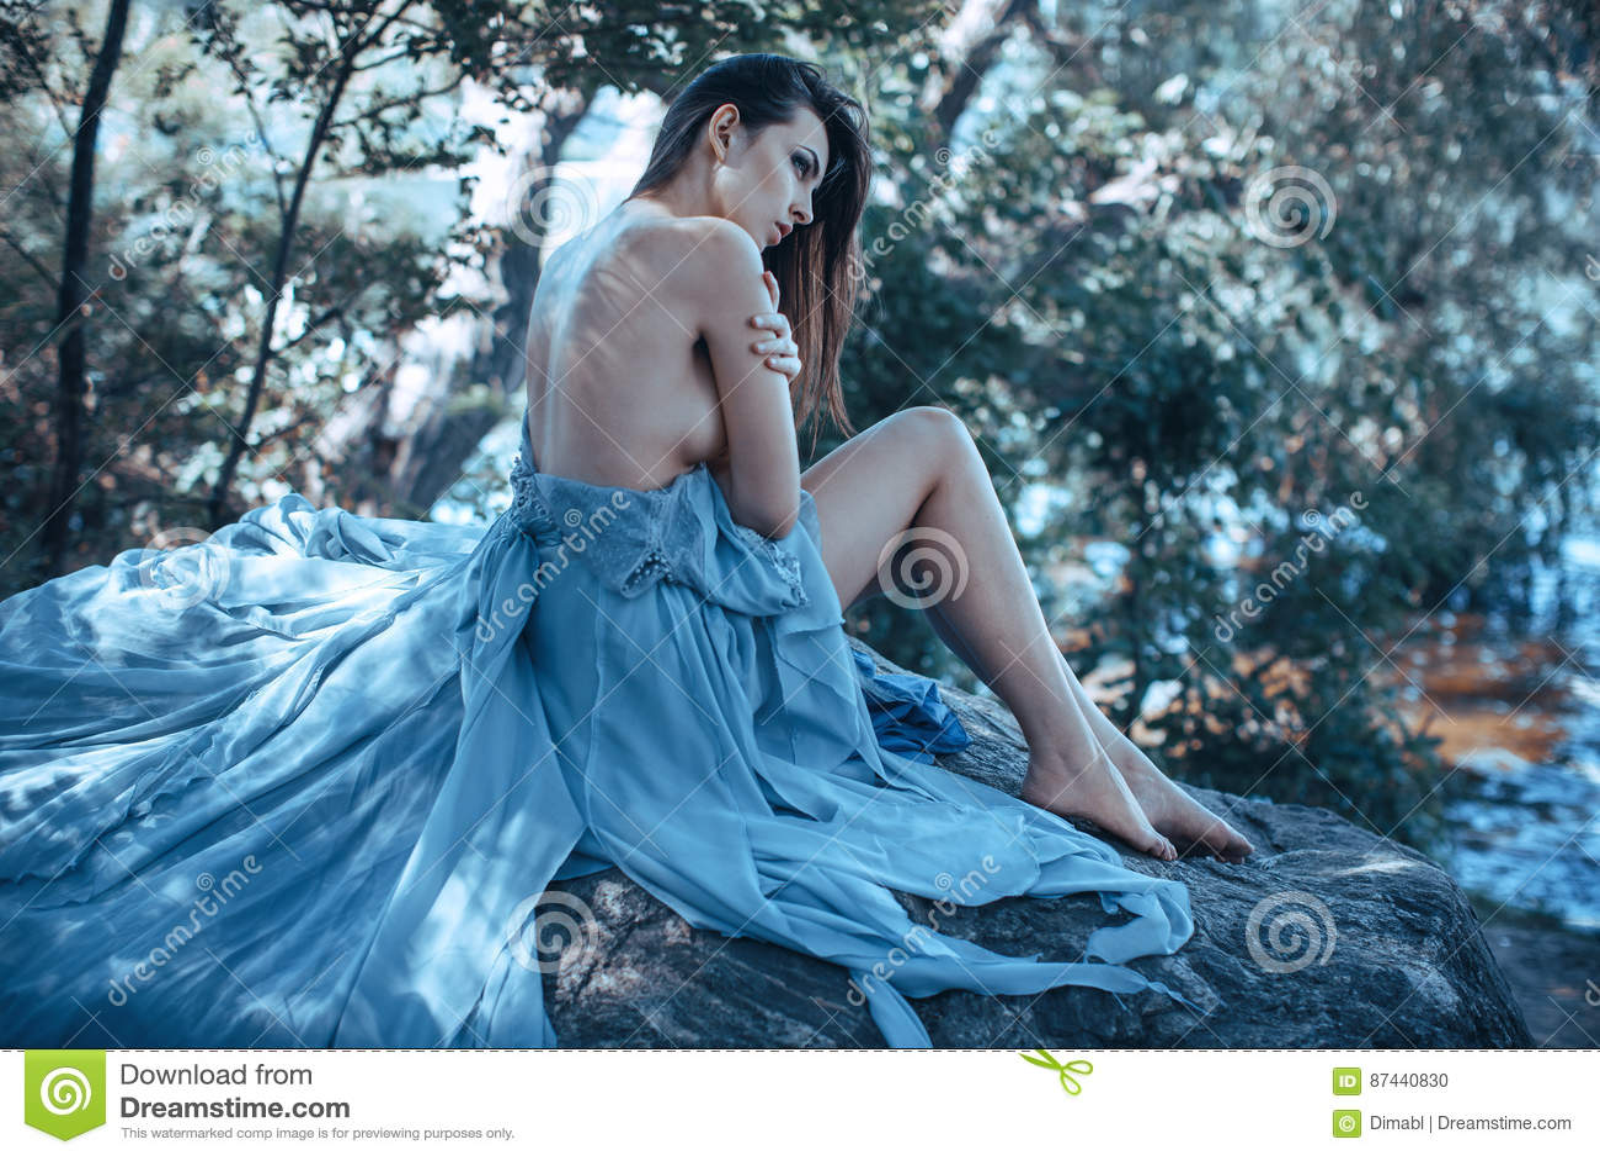 Naked girl sitting on beach all